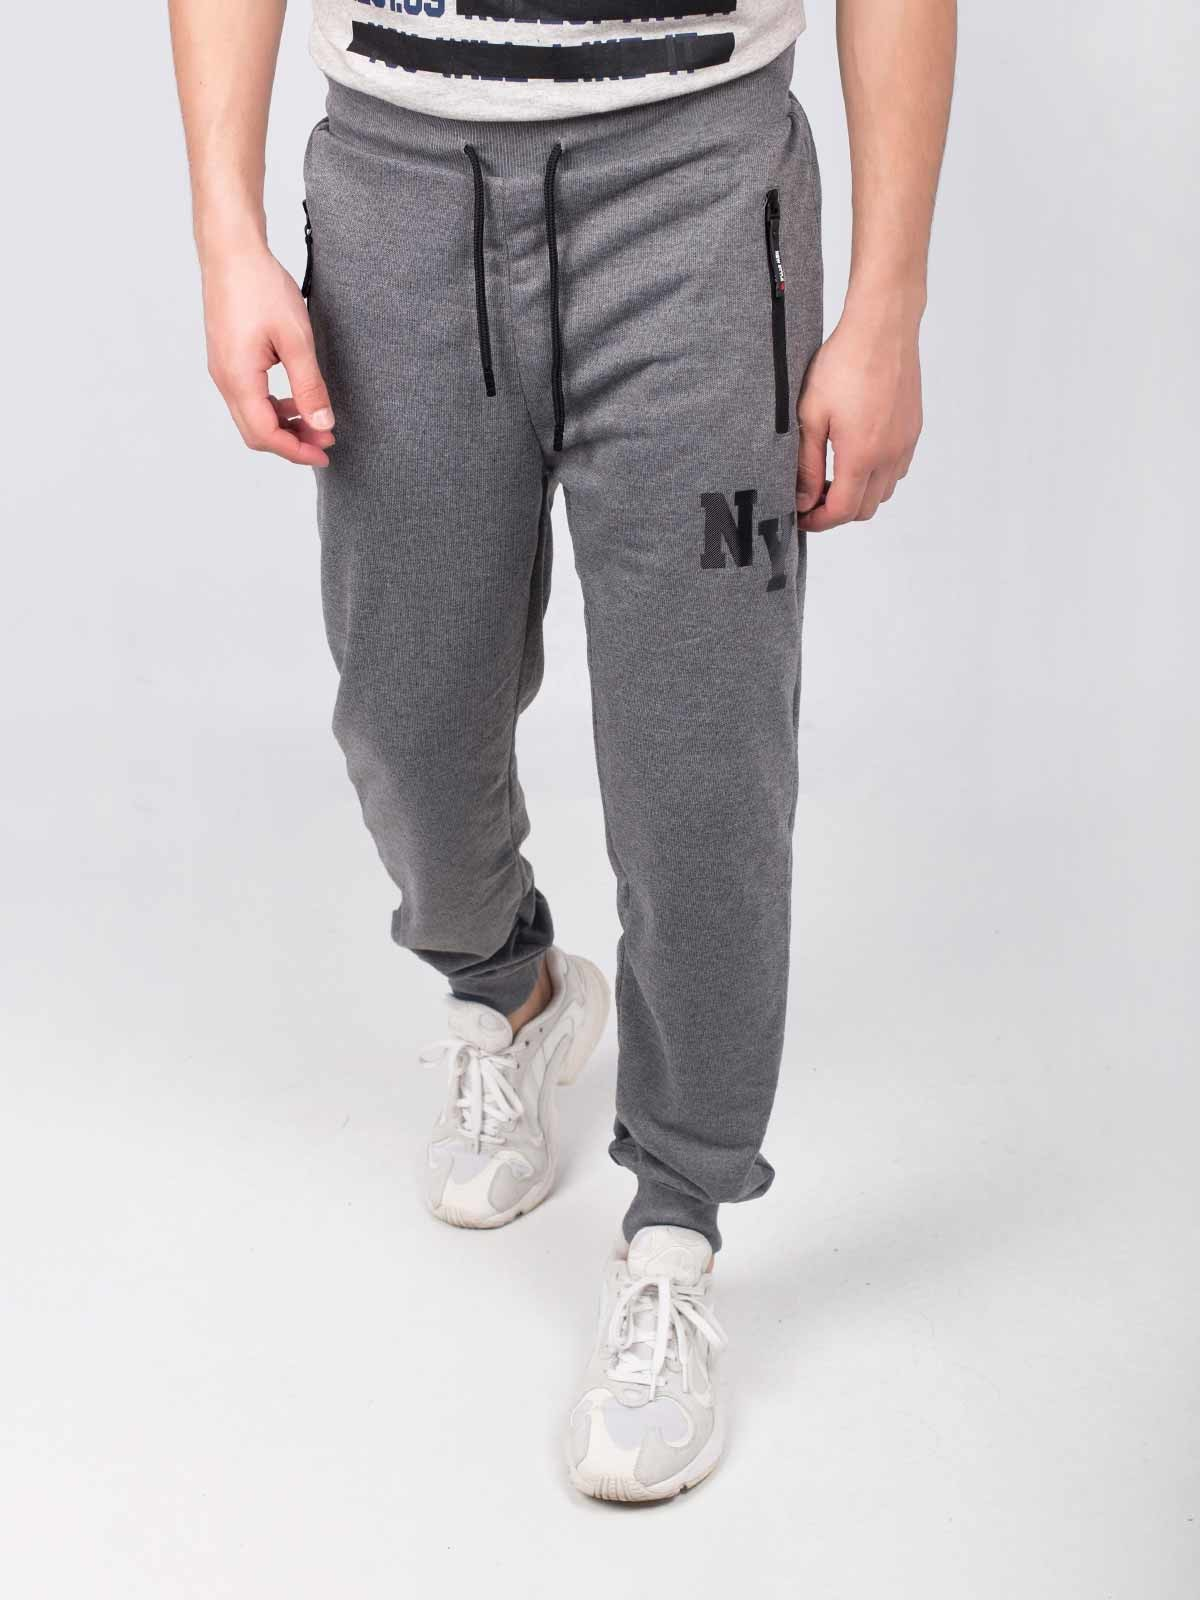 Pantalones deportivos símbolo NY